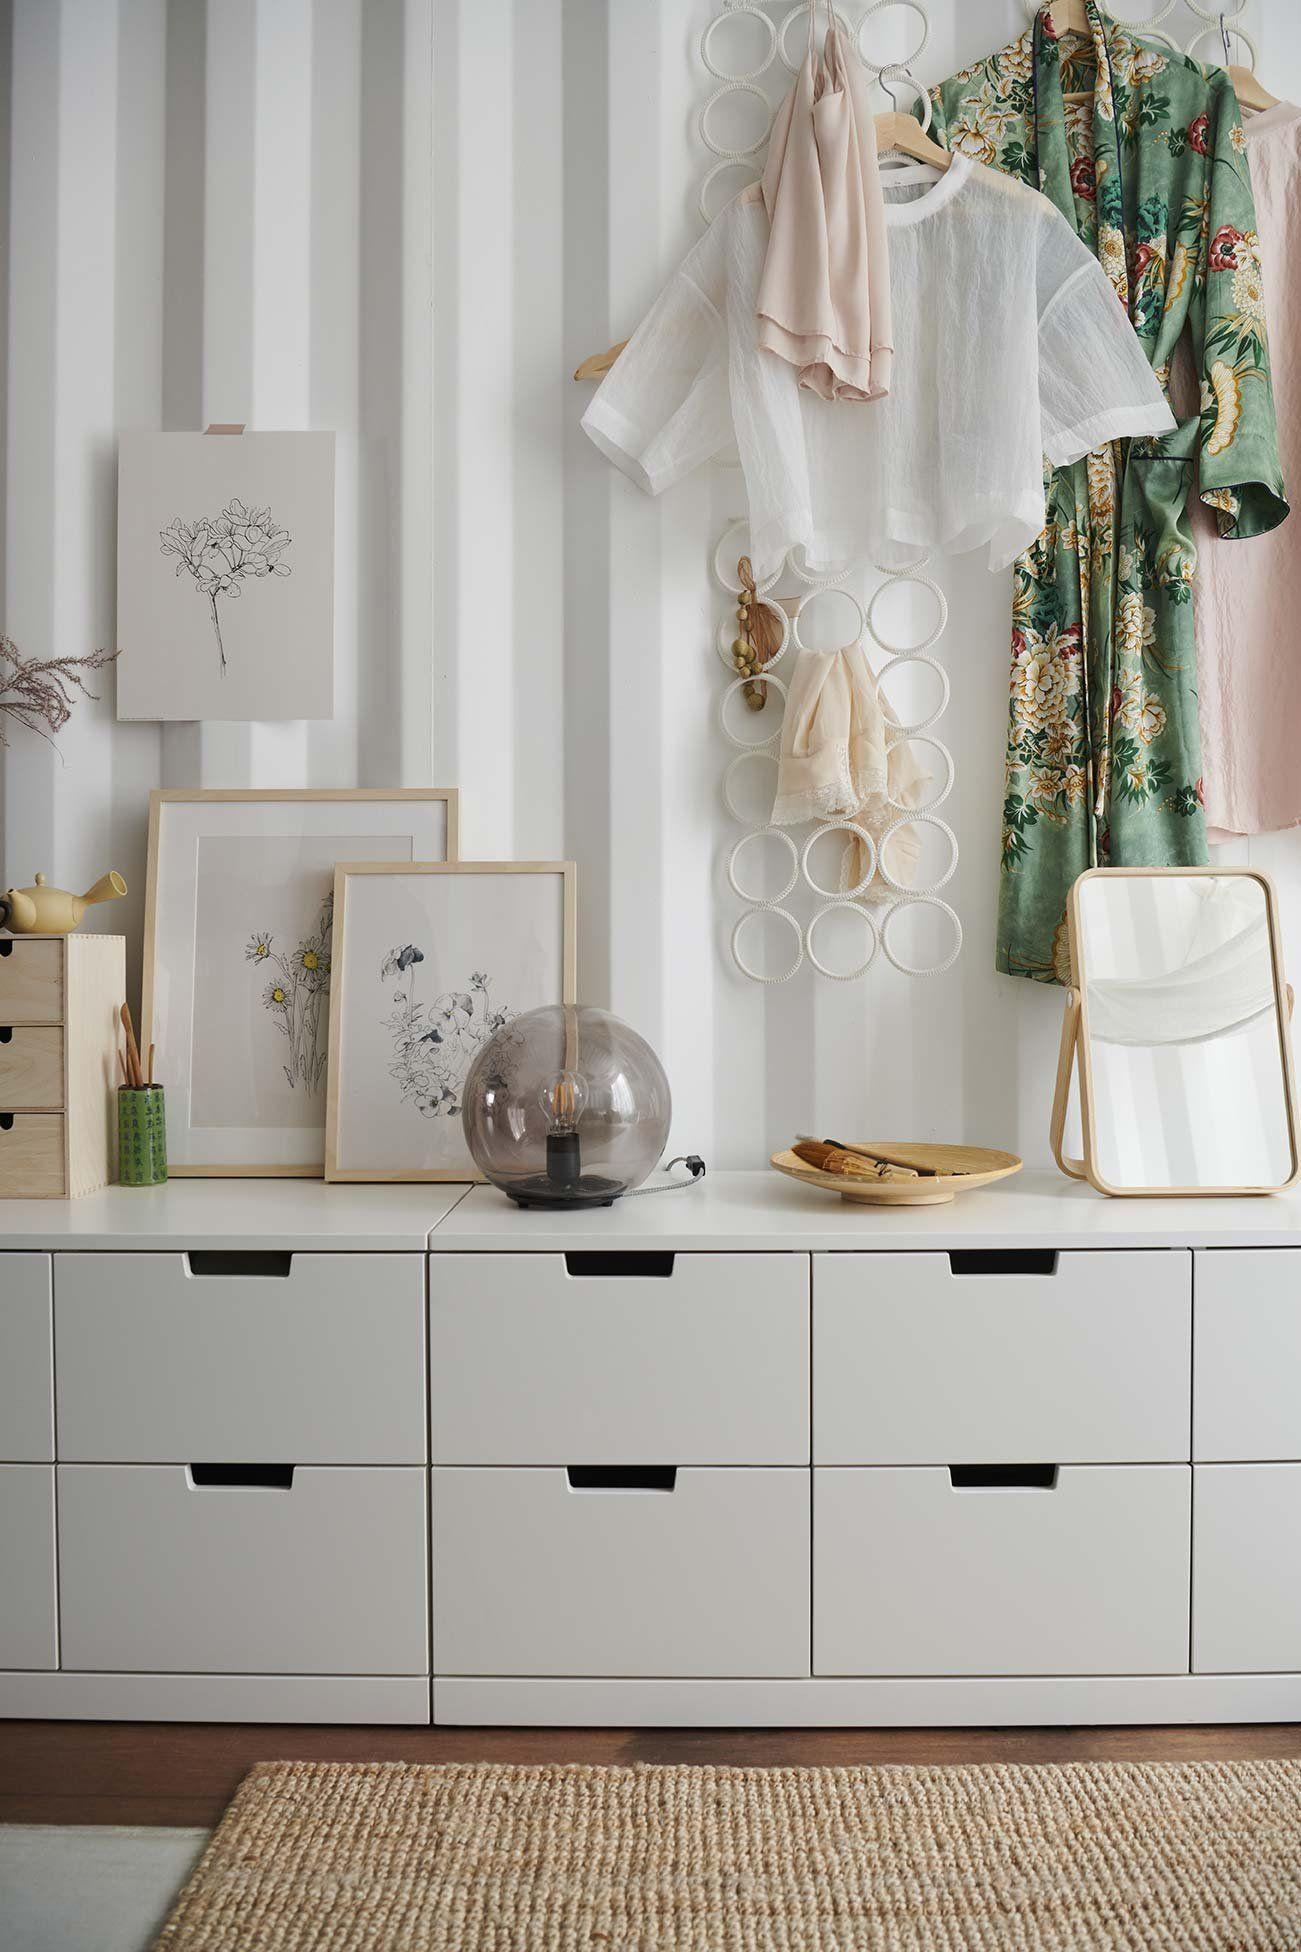 Pictures of Mobilier De Chambre Ikea